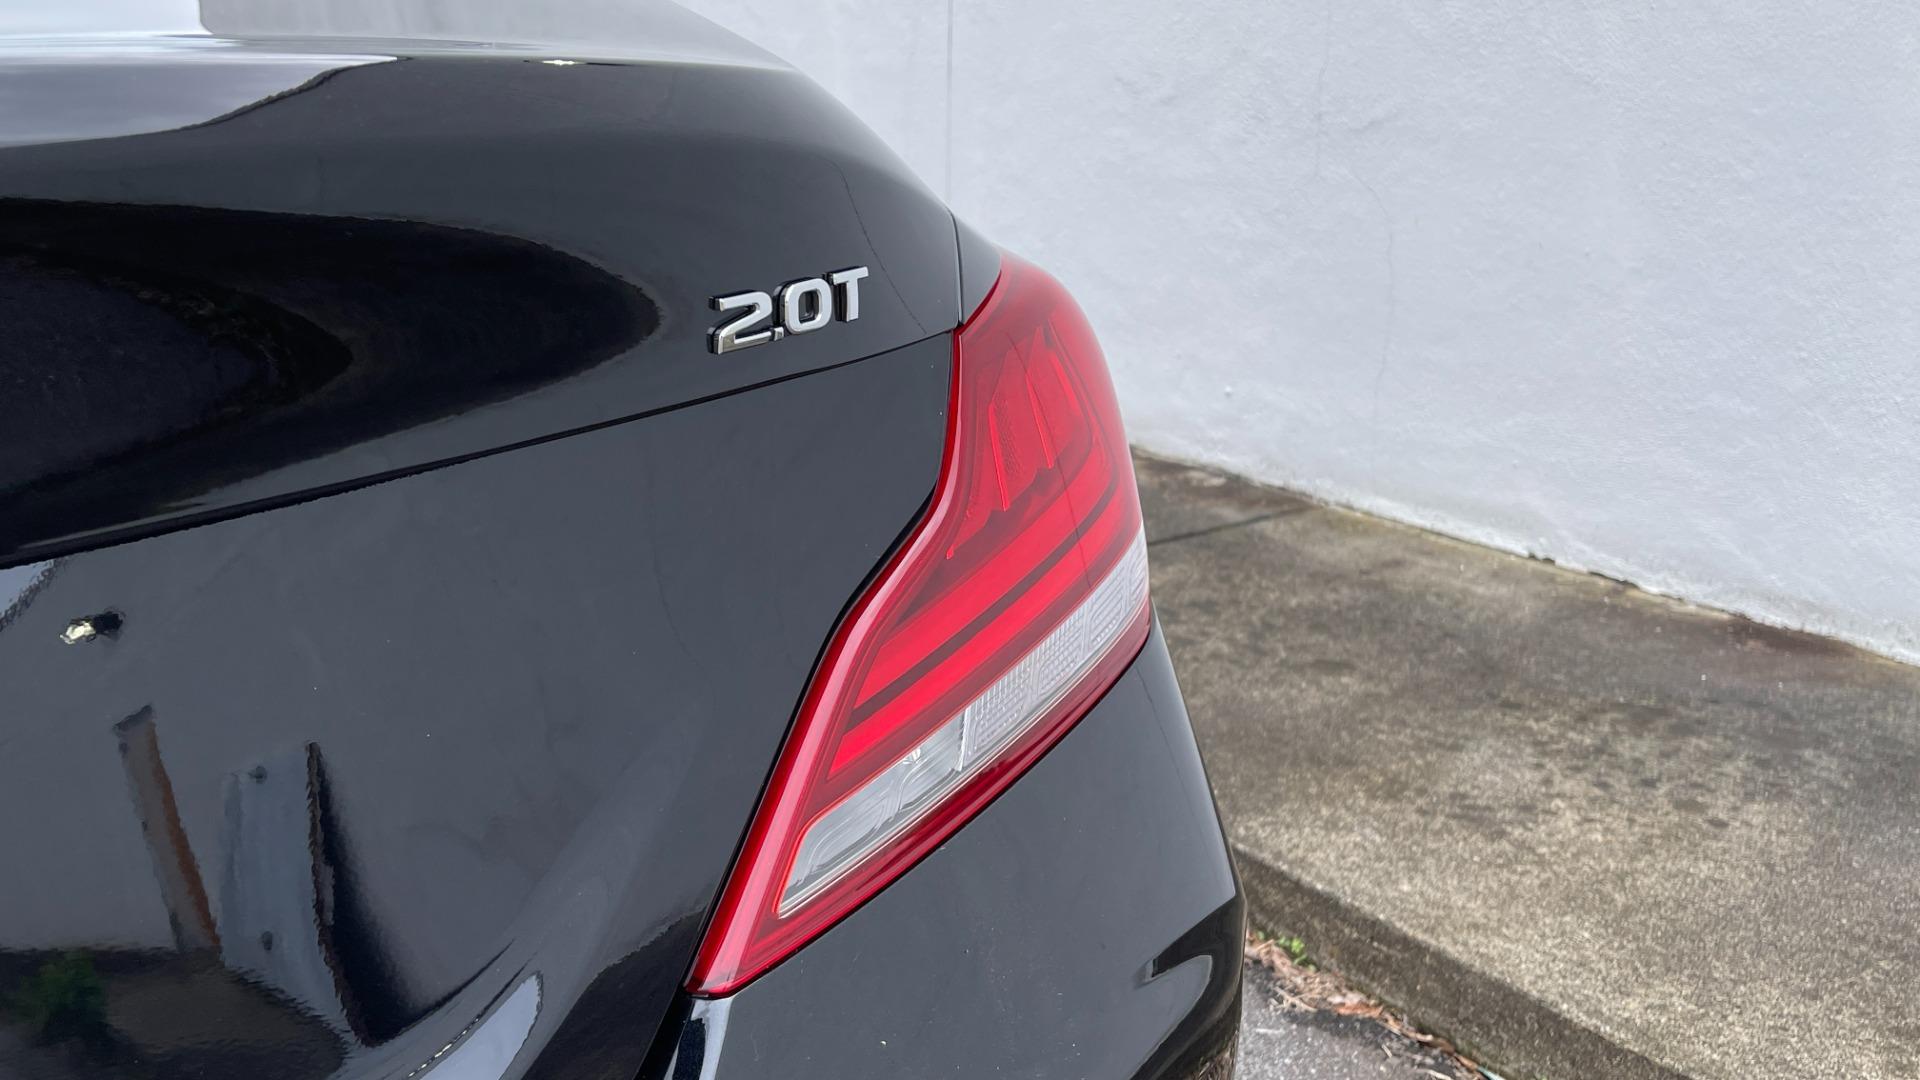 Used 2021 Genesis G70 ELITE 2.0T SEDAN / NAV / LANE ASST / BSA / SUNROOF / LEATHER / REARVIEW for sale $39,995 at Formula Imports in Charlotte NC 28227 14